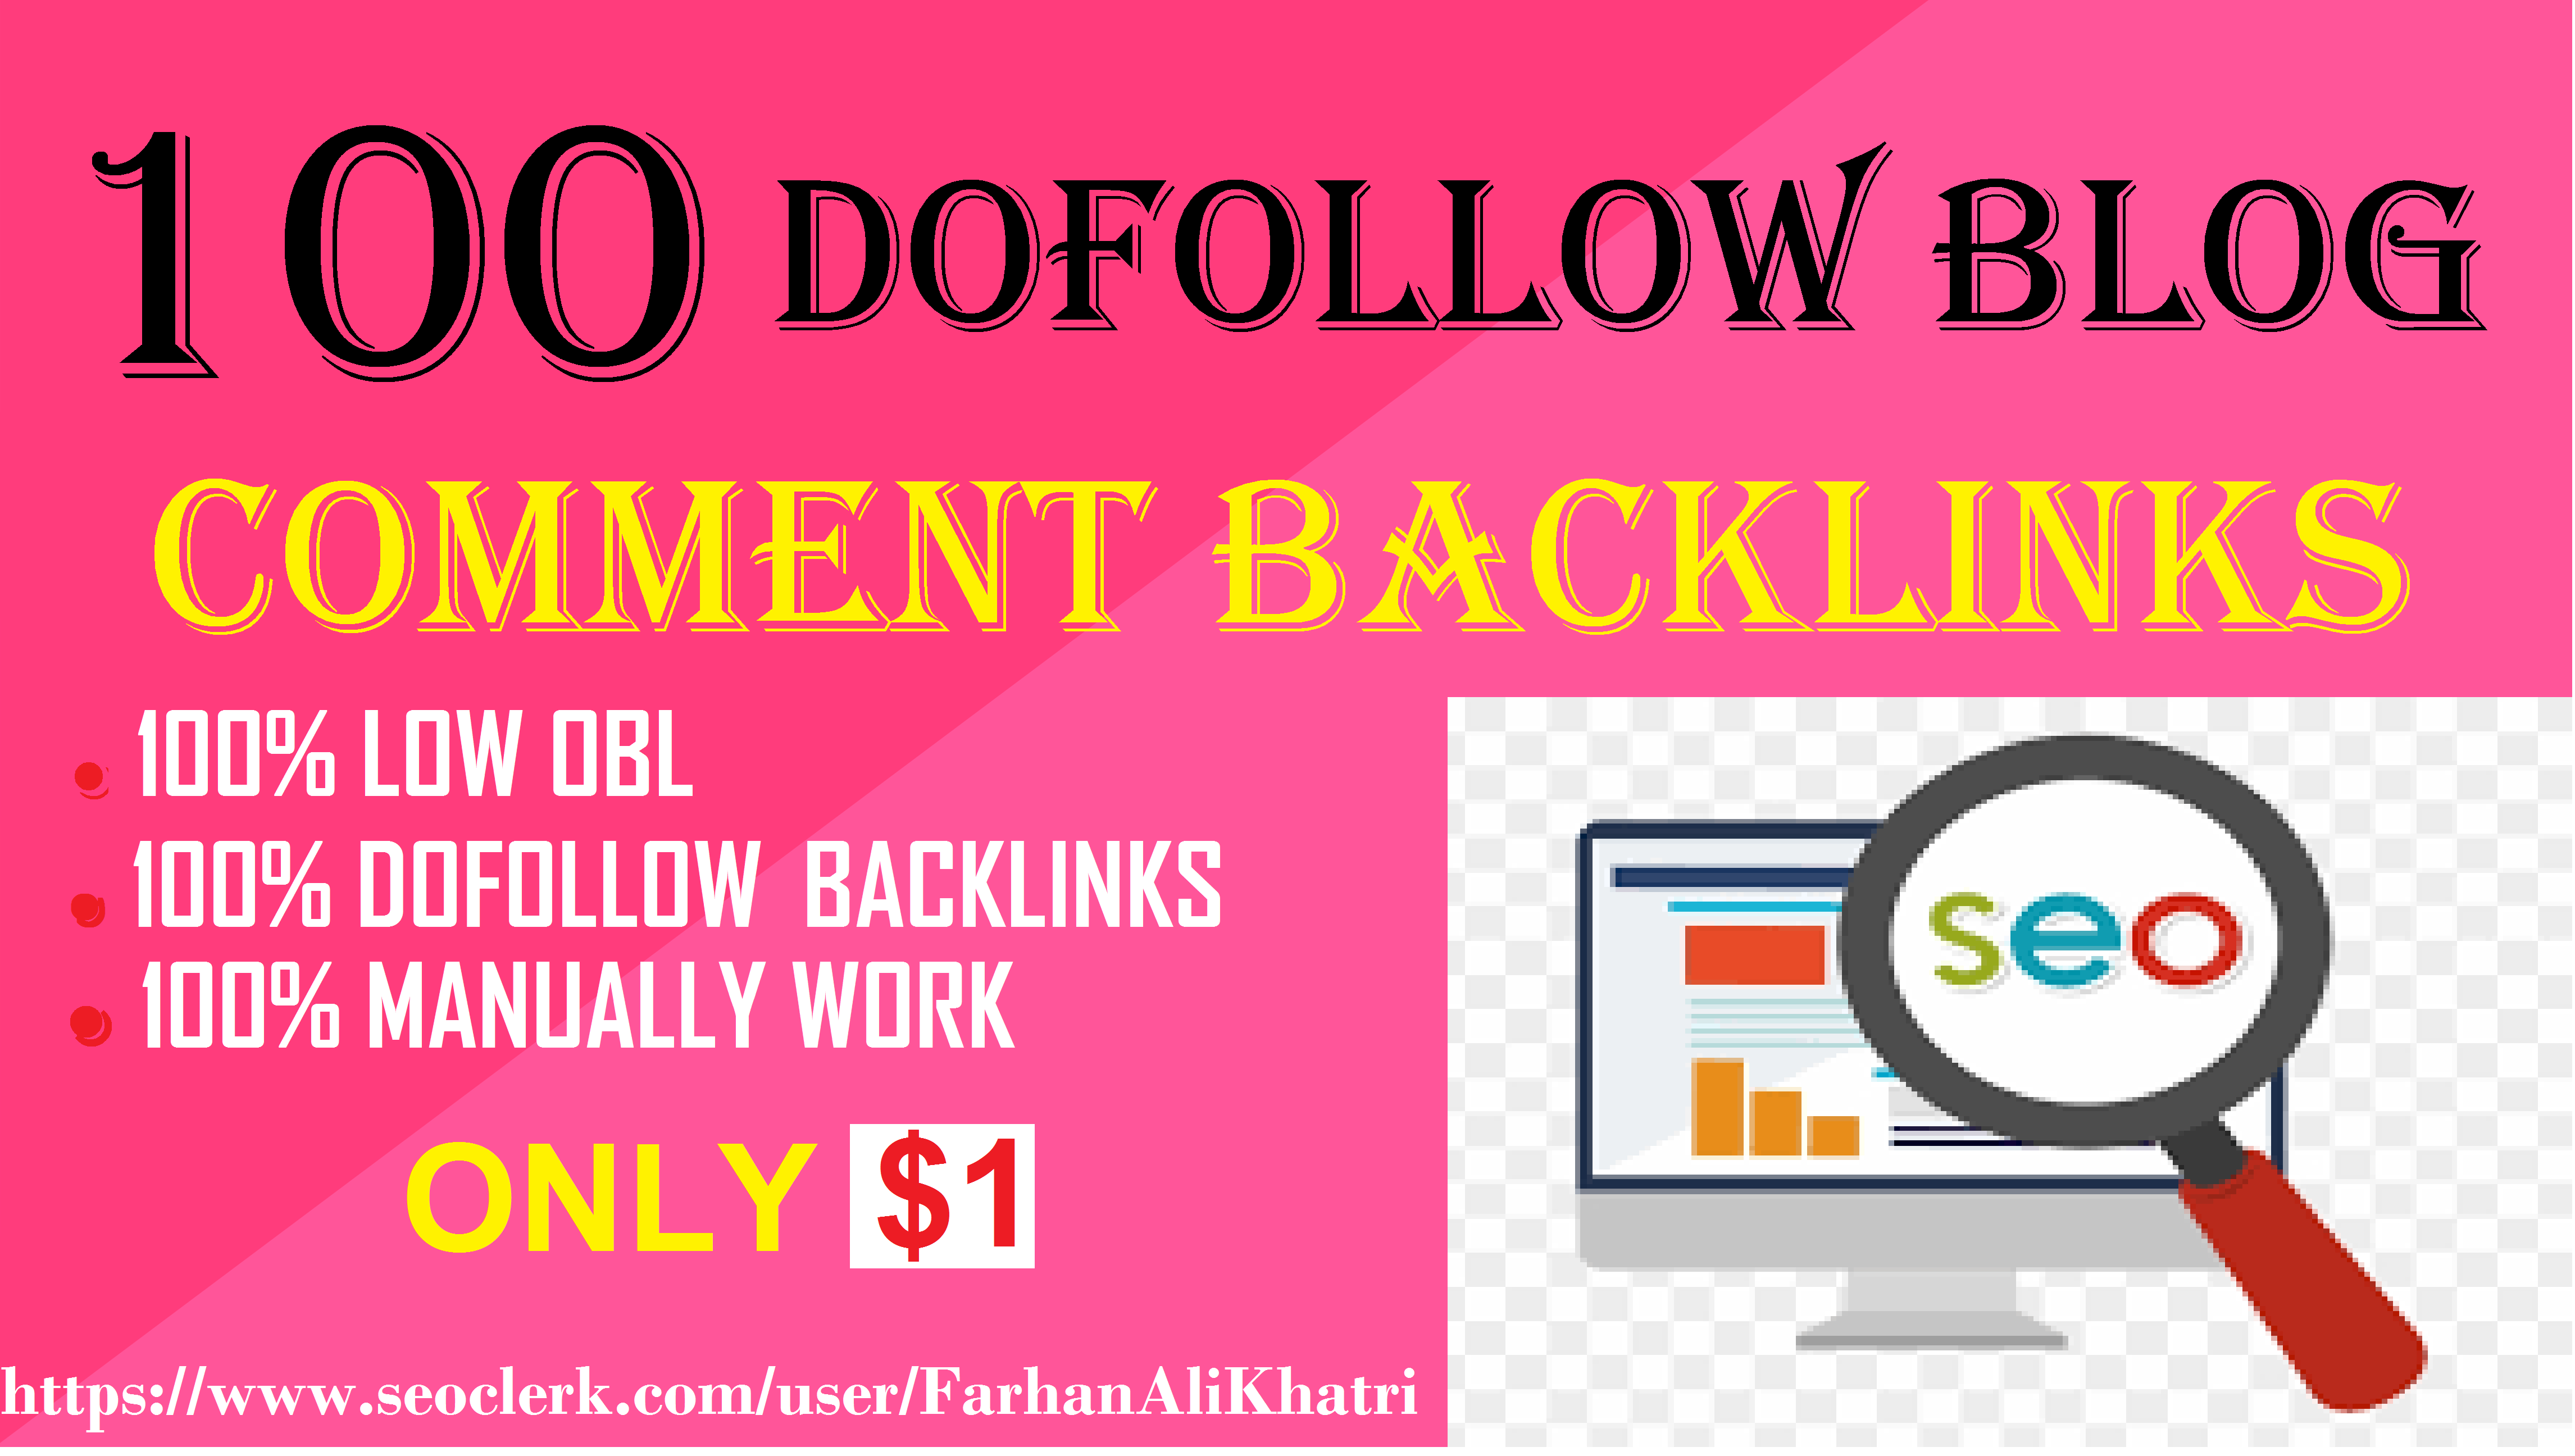 I will create 100 high quality dofollow backlinks to rank high